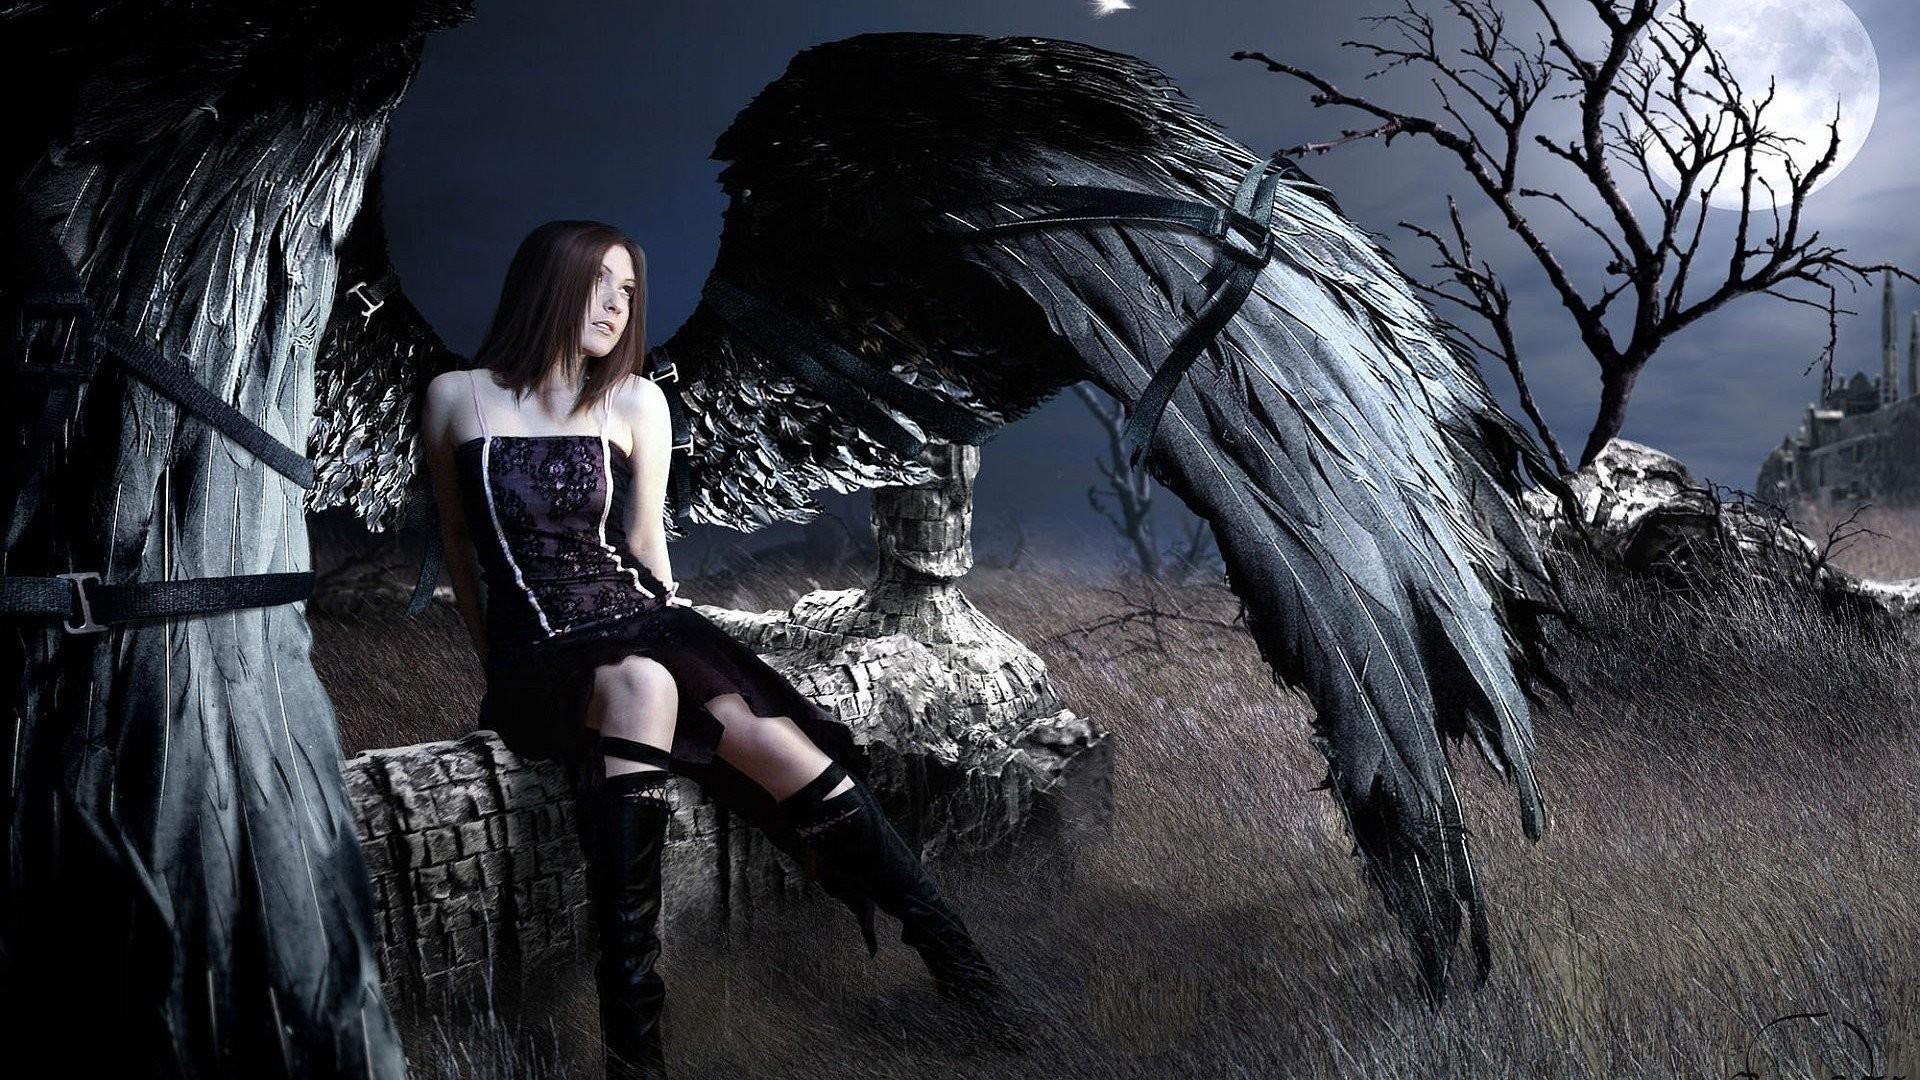 dark angel wallpapers 47 images